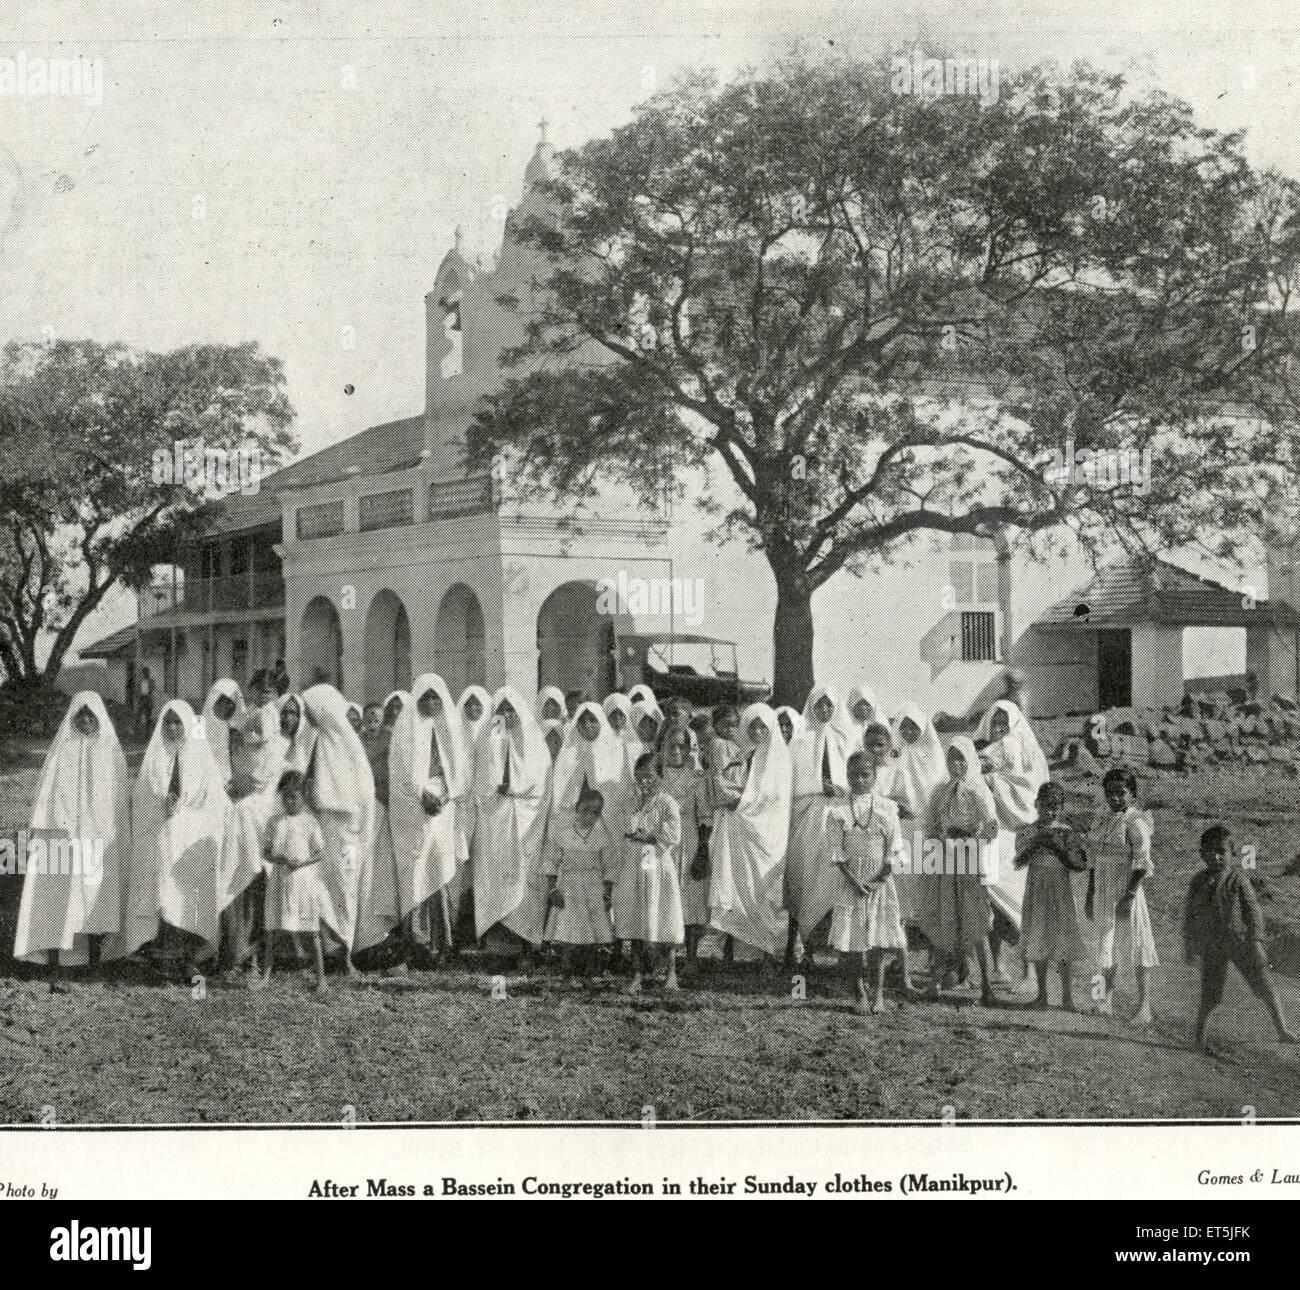 Catholic community after mass Bassein congregation in their Sunday clothes Manikpur ; Vasai ; Maharashtra ; India - Stock Image